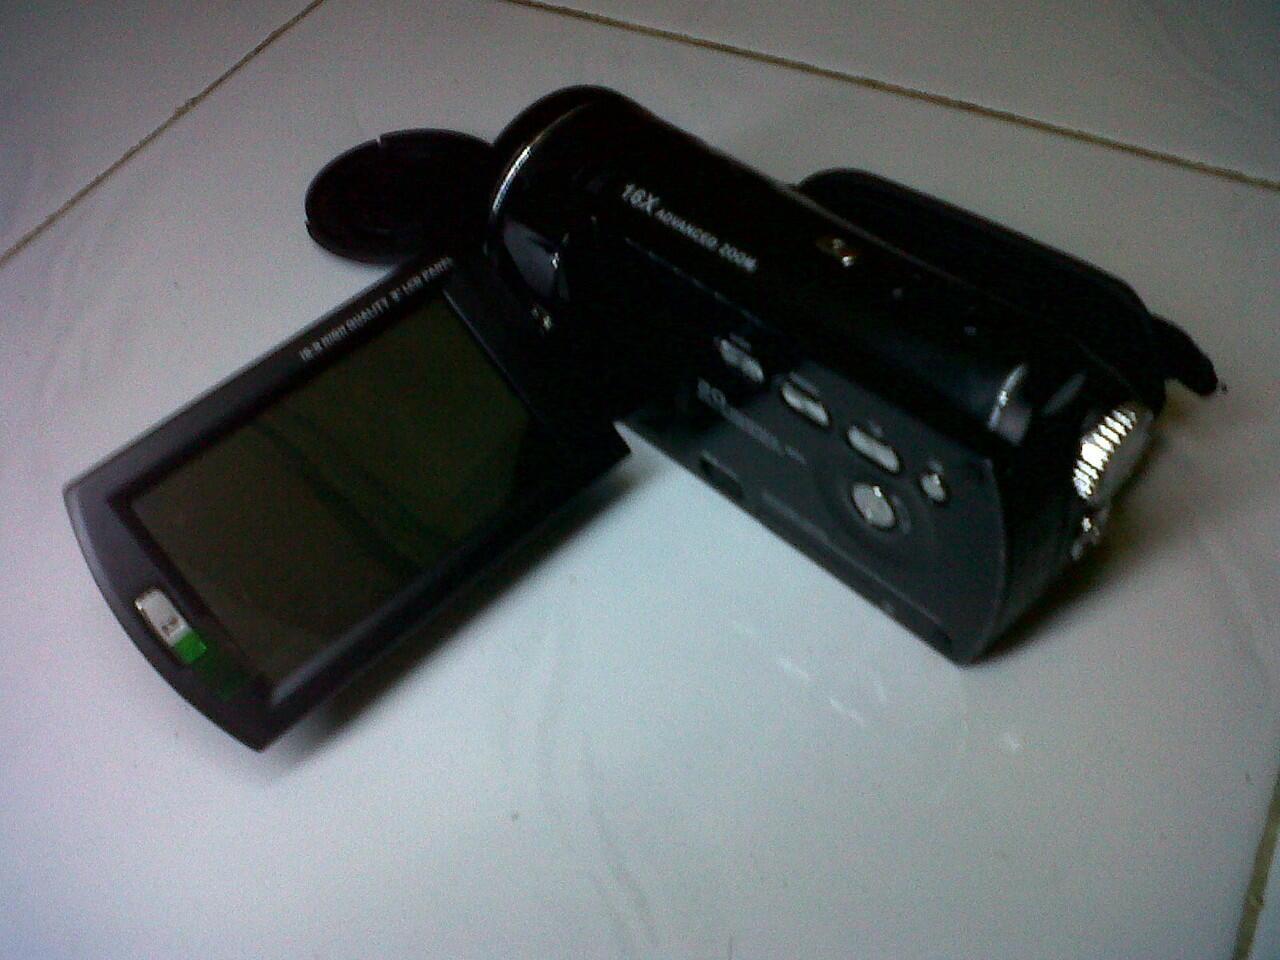 Handycam Spectra Camcorder DX10 Vertex Murah Meriah (Nyesel ga masuk)